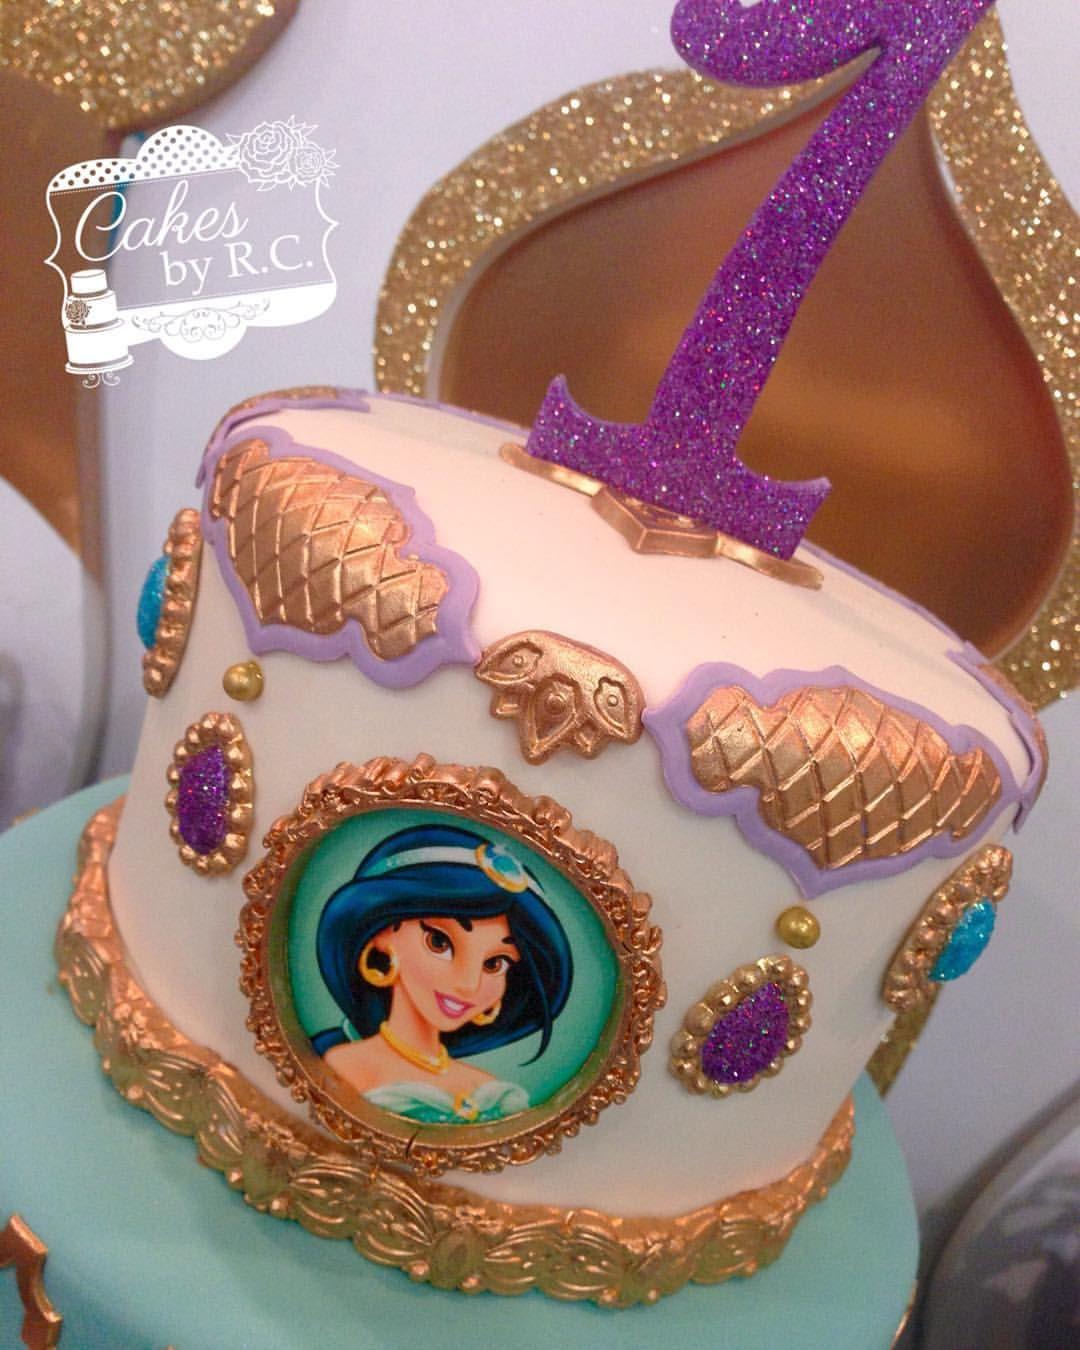 Superb Tbt Jasmine Inspired Cake Cakesbyrc Cakedecorator Jasmine Personalised Birthday Cards Arneslily Jamesorg